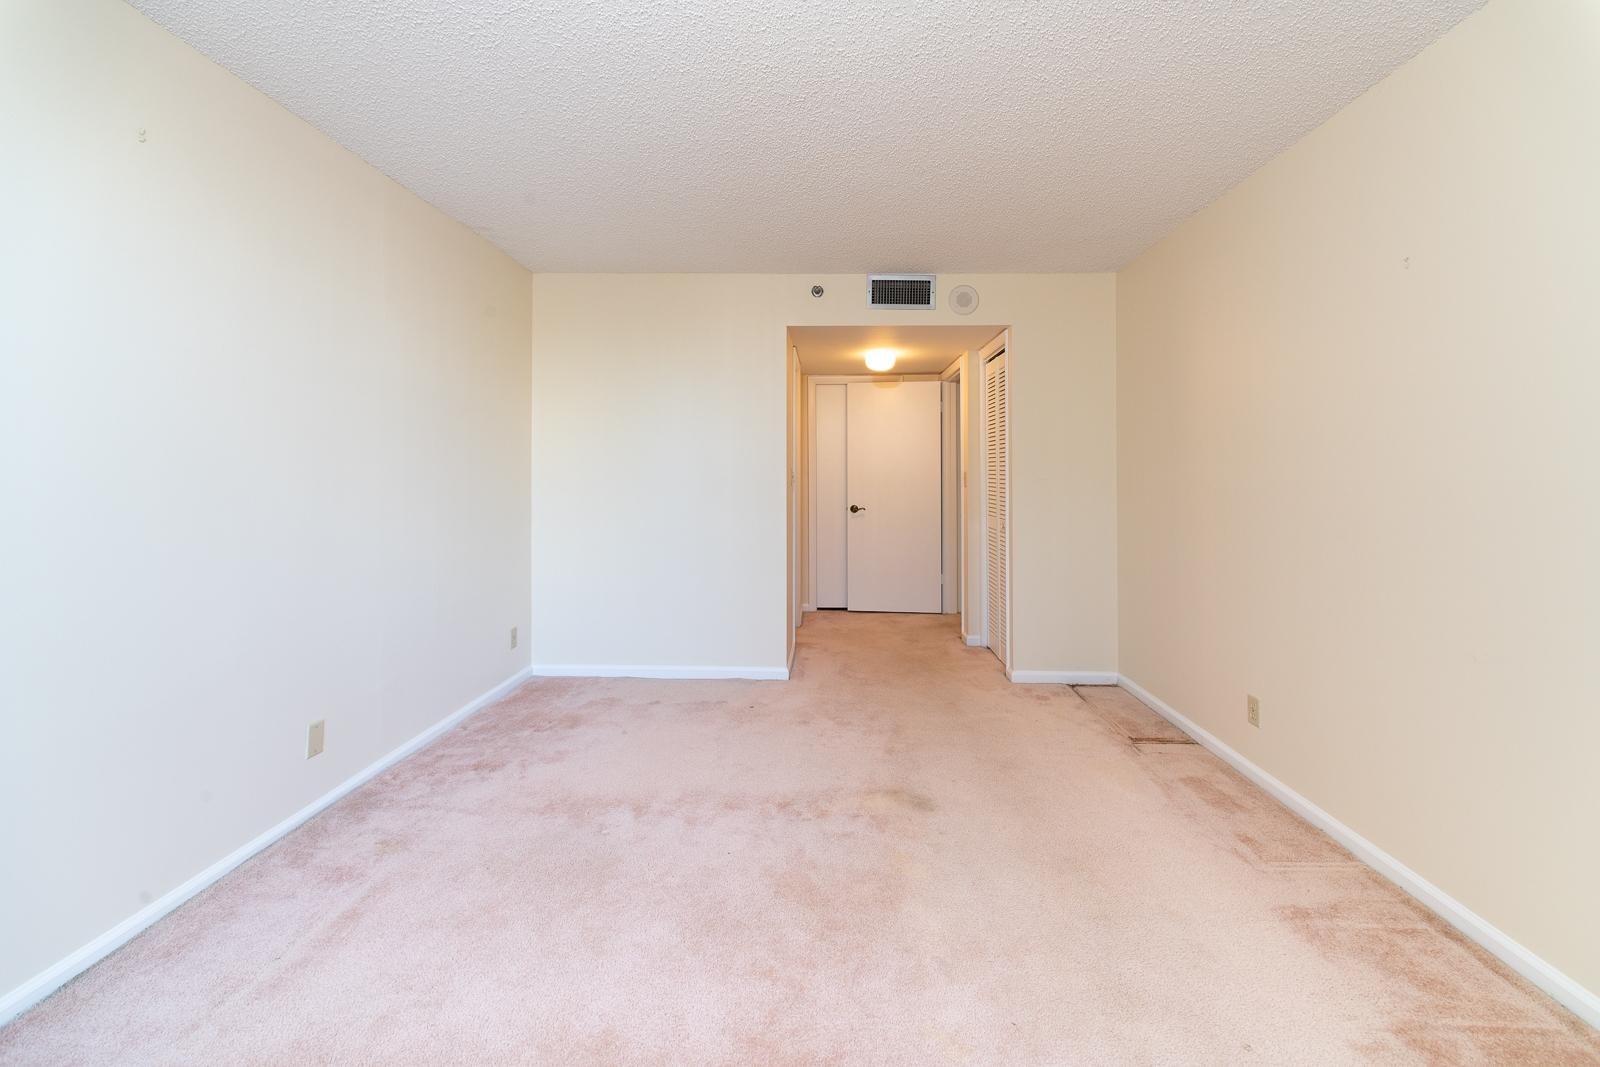 Bedroom Remodel Hallandale